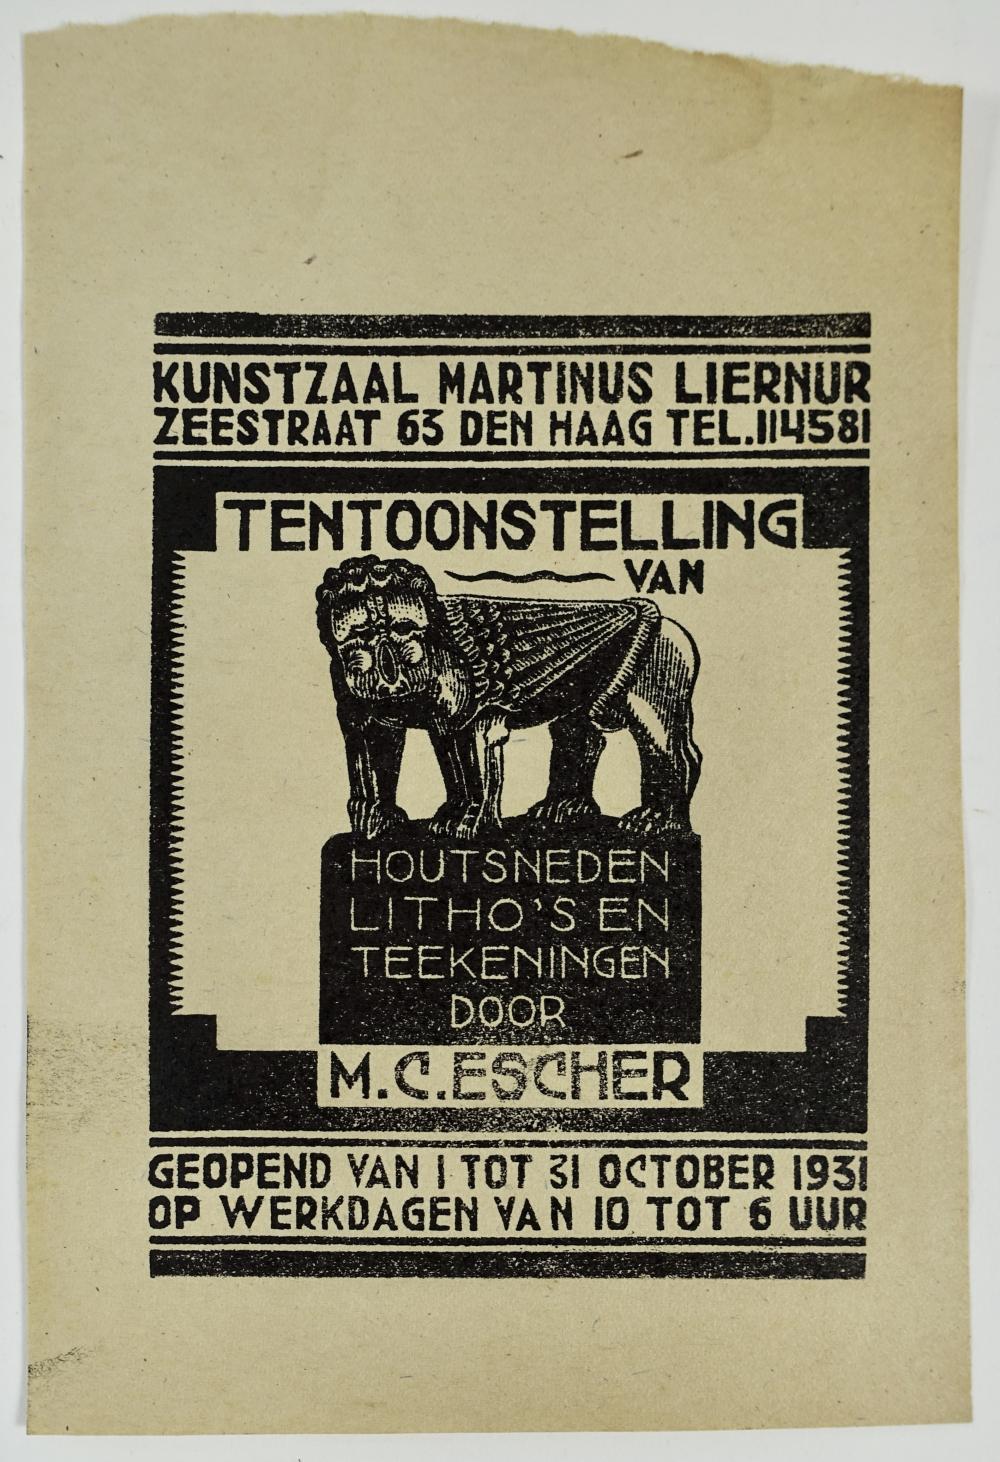 ESCHER, M.C. (1898-1972). Uitnodiging, september 1931. (1931). Woodcut 12 x 9 cm